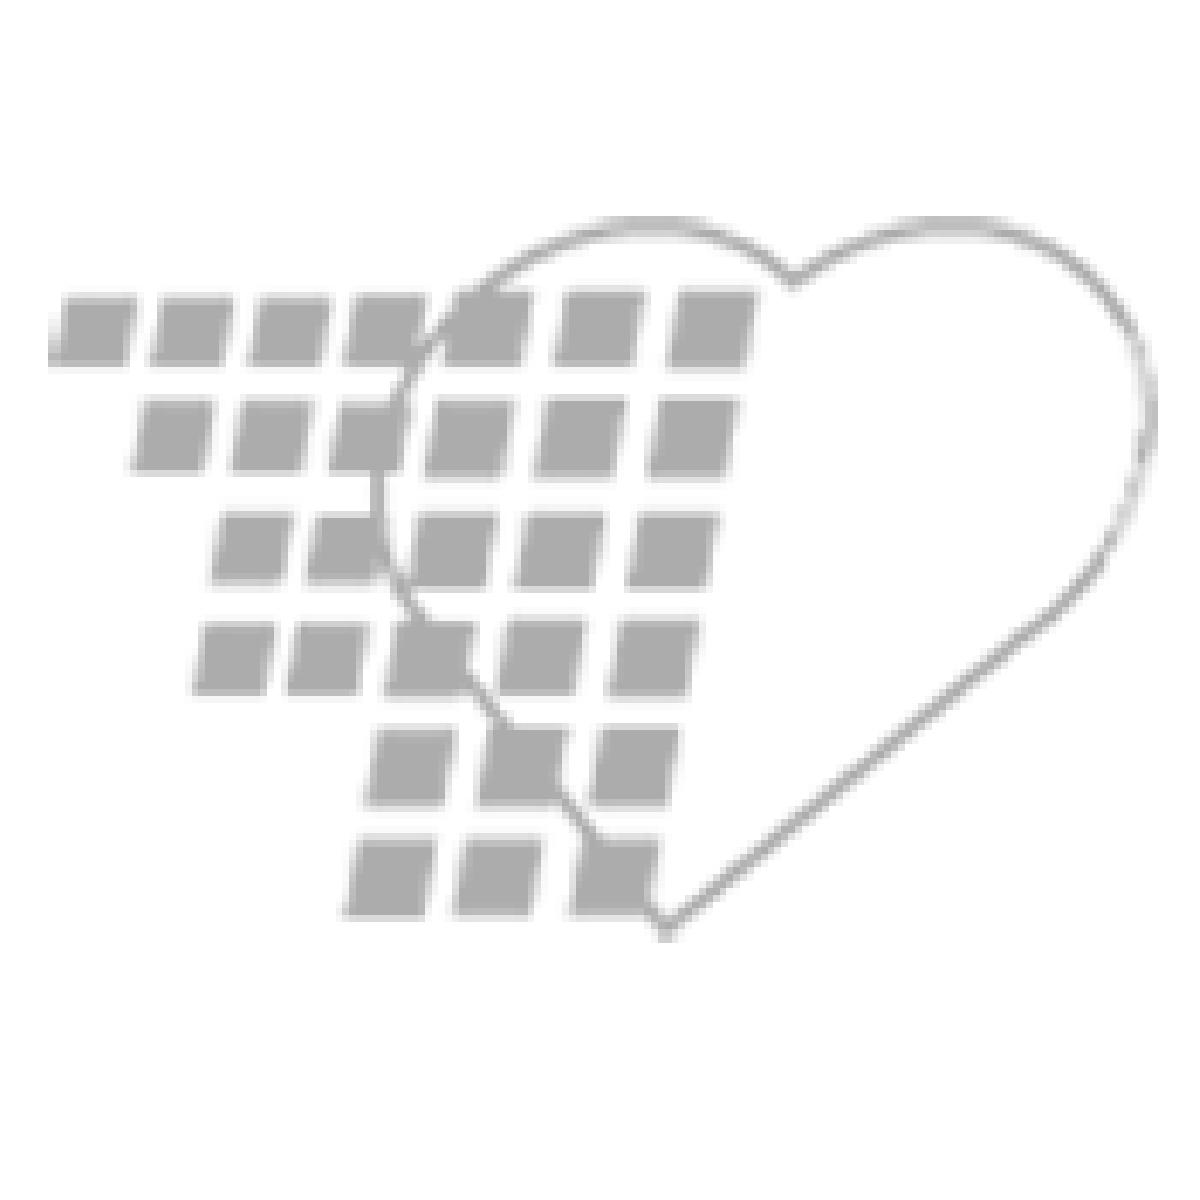 06-93-0048 - Demo Dose® Glucotrl 5 mg - 100 Pills/Box